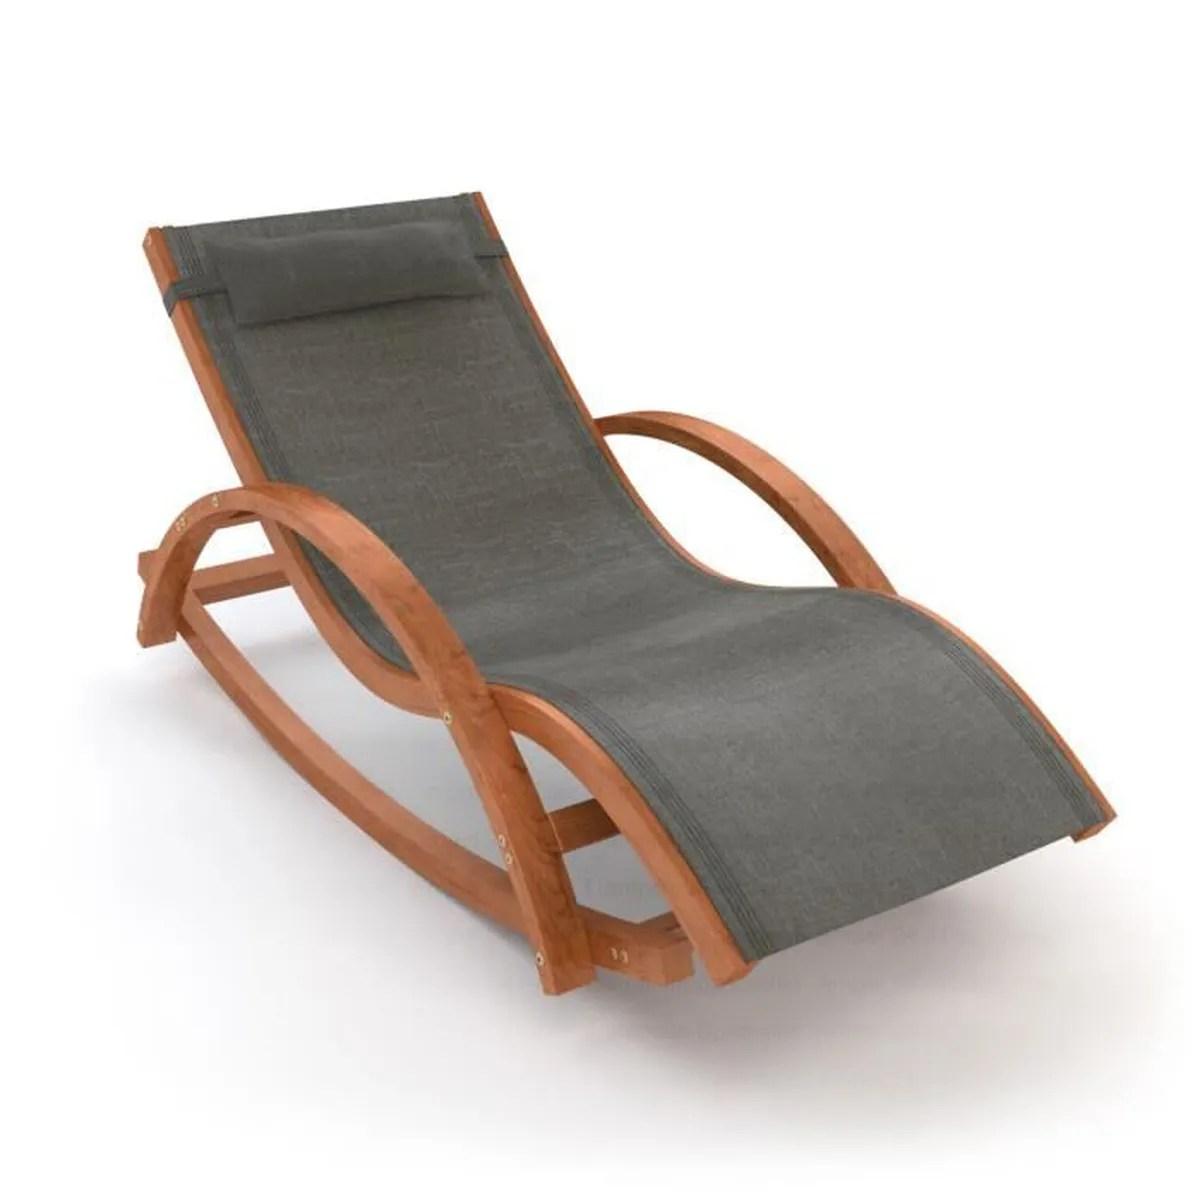 Chaise Longue Veranda Jardin